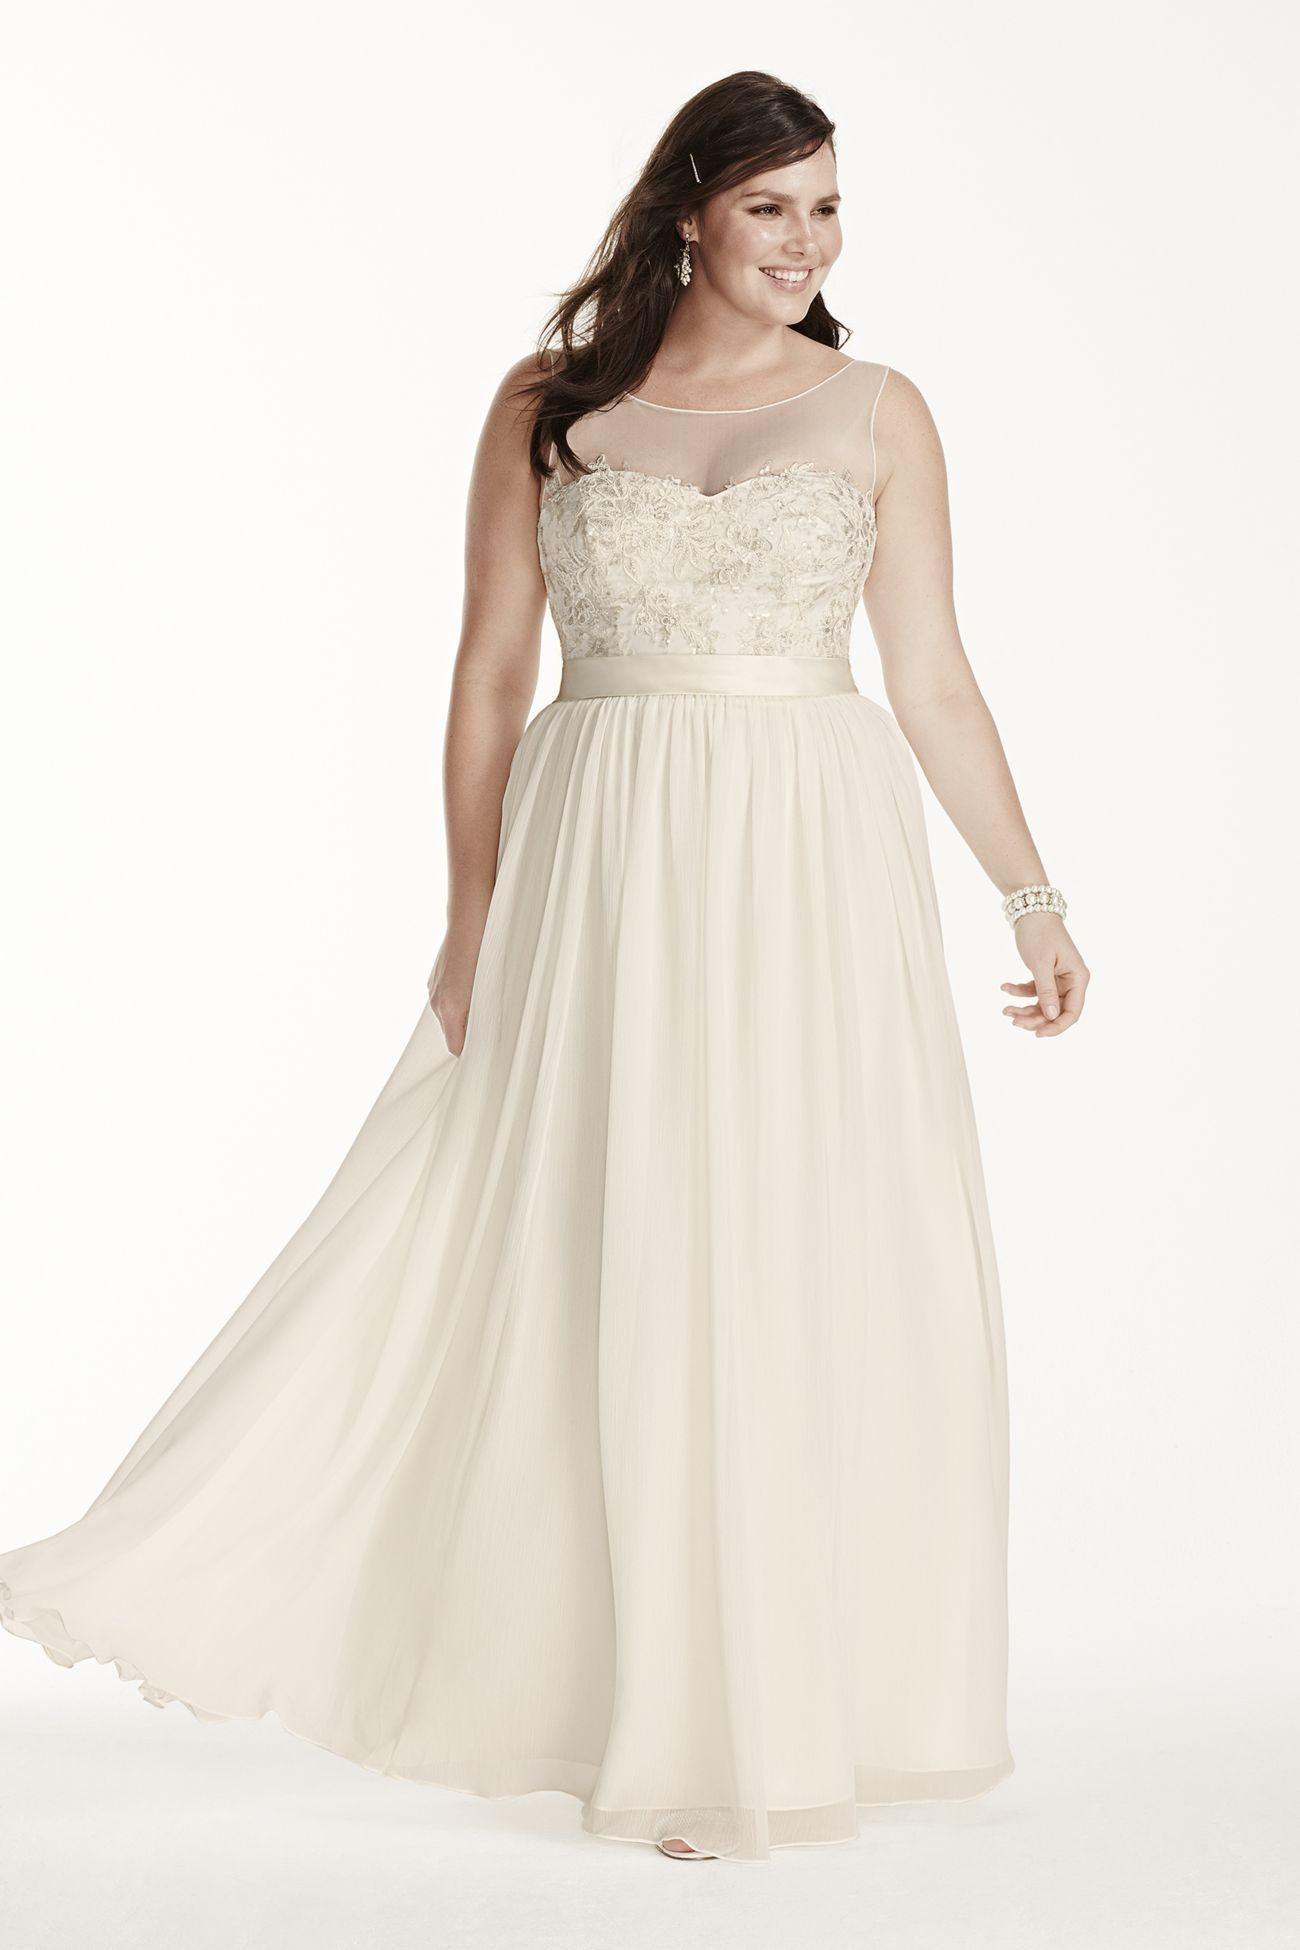 My New Favorite! www.davidsbridal.com/10414152 | Wedding | Pinterest ...